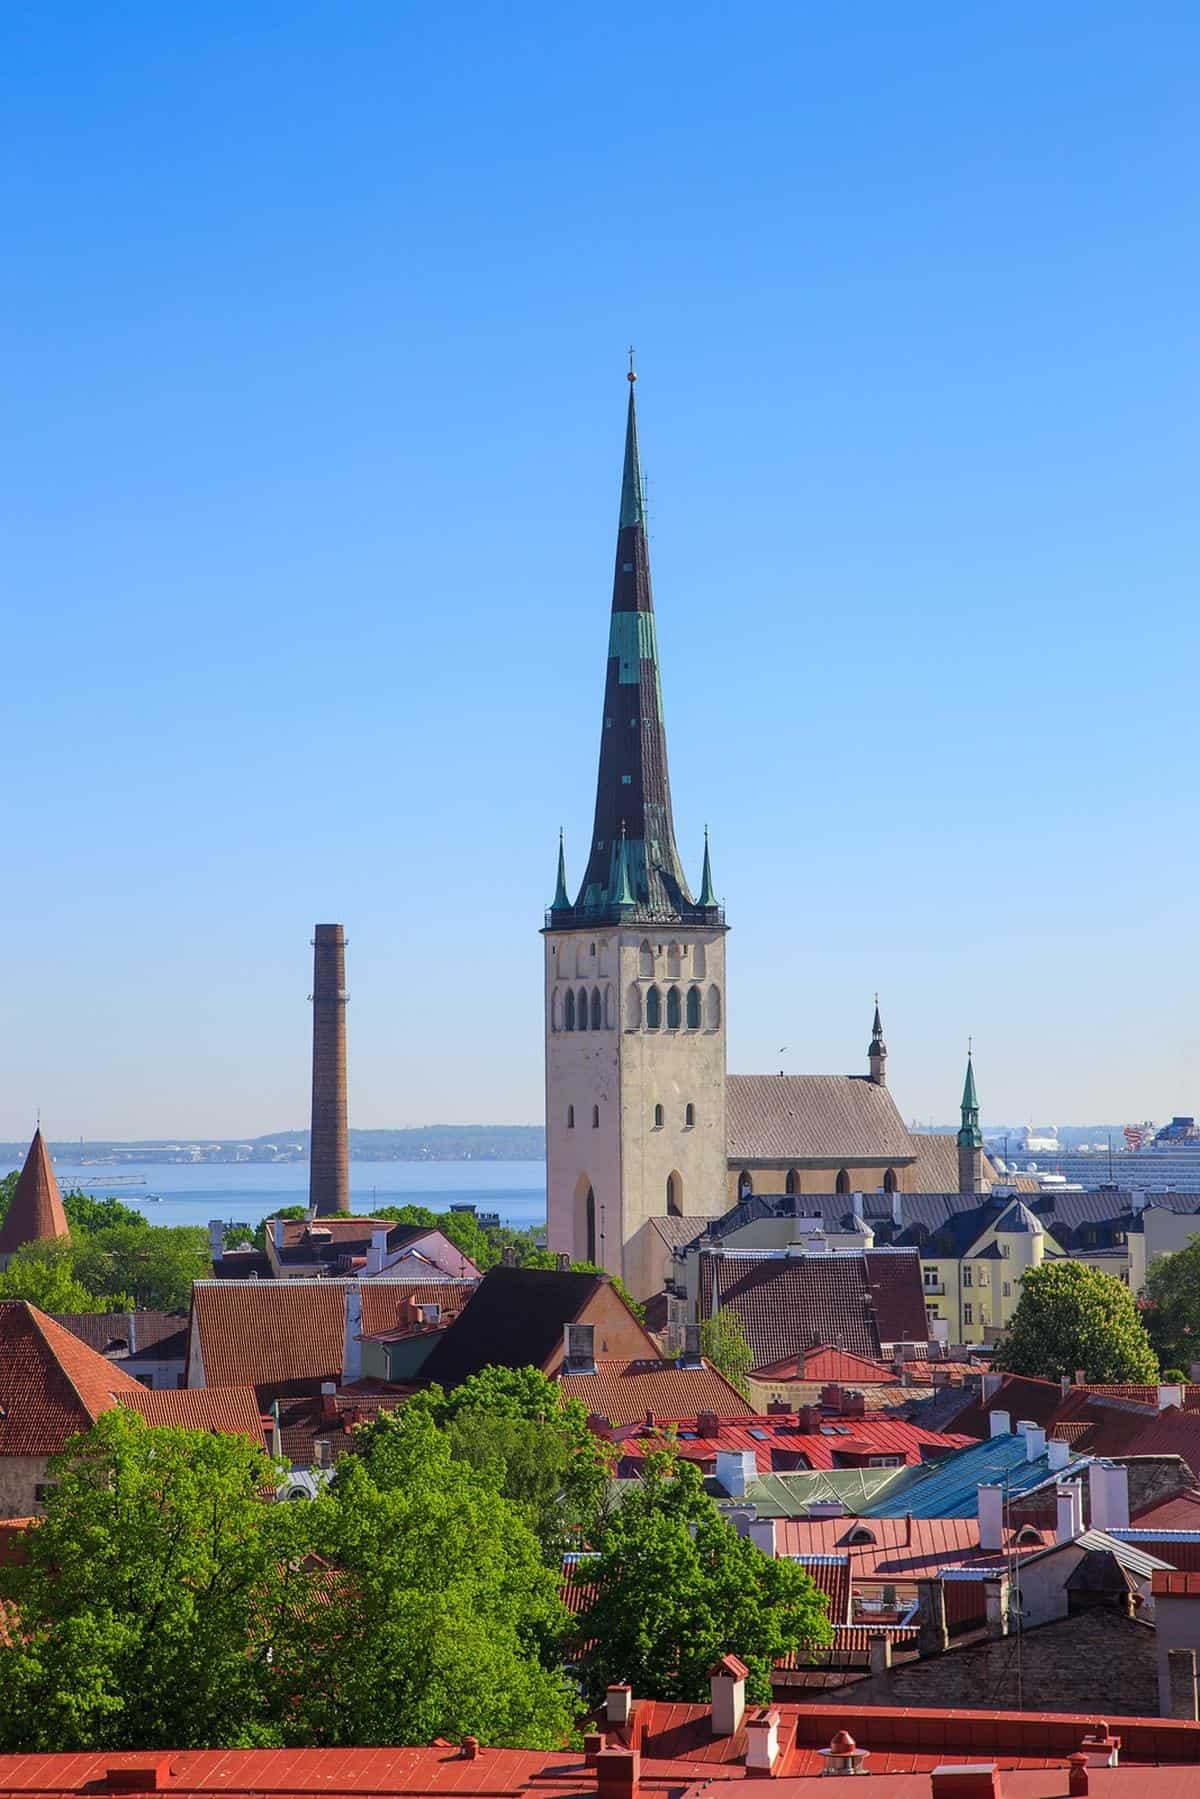 St. Olaf's Church in Tallinn